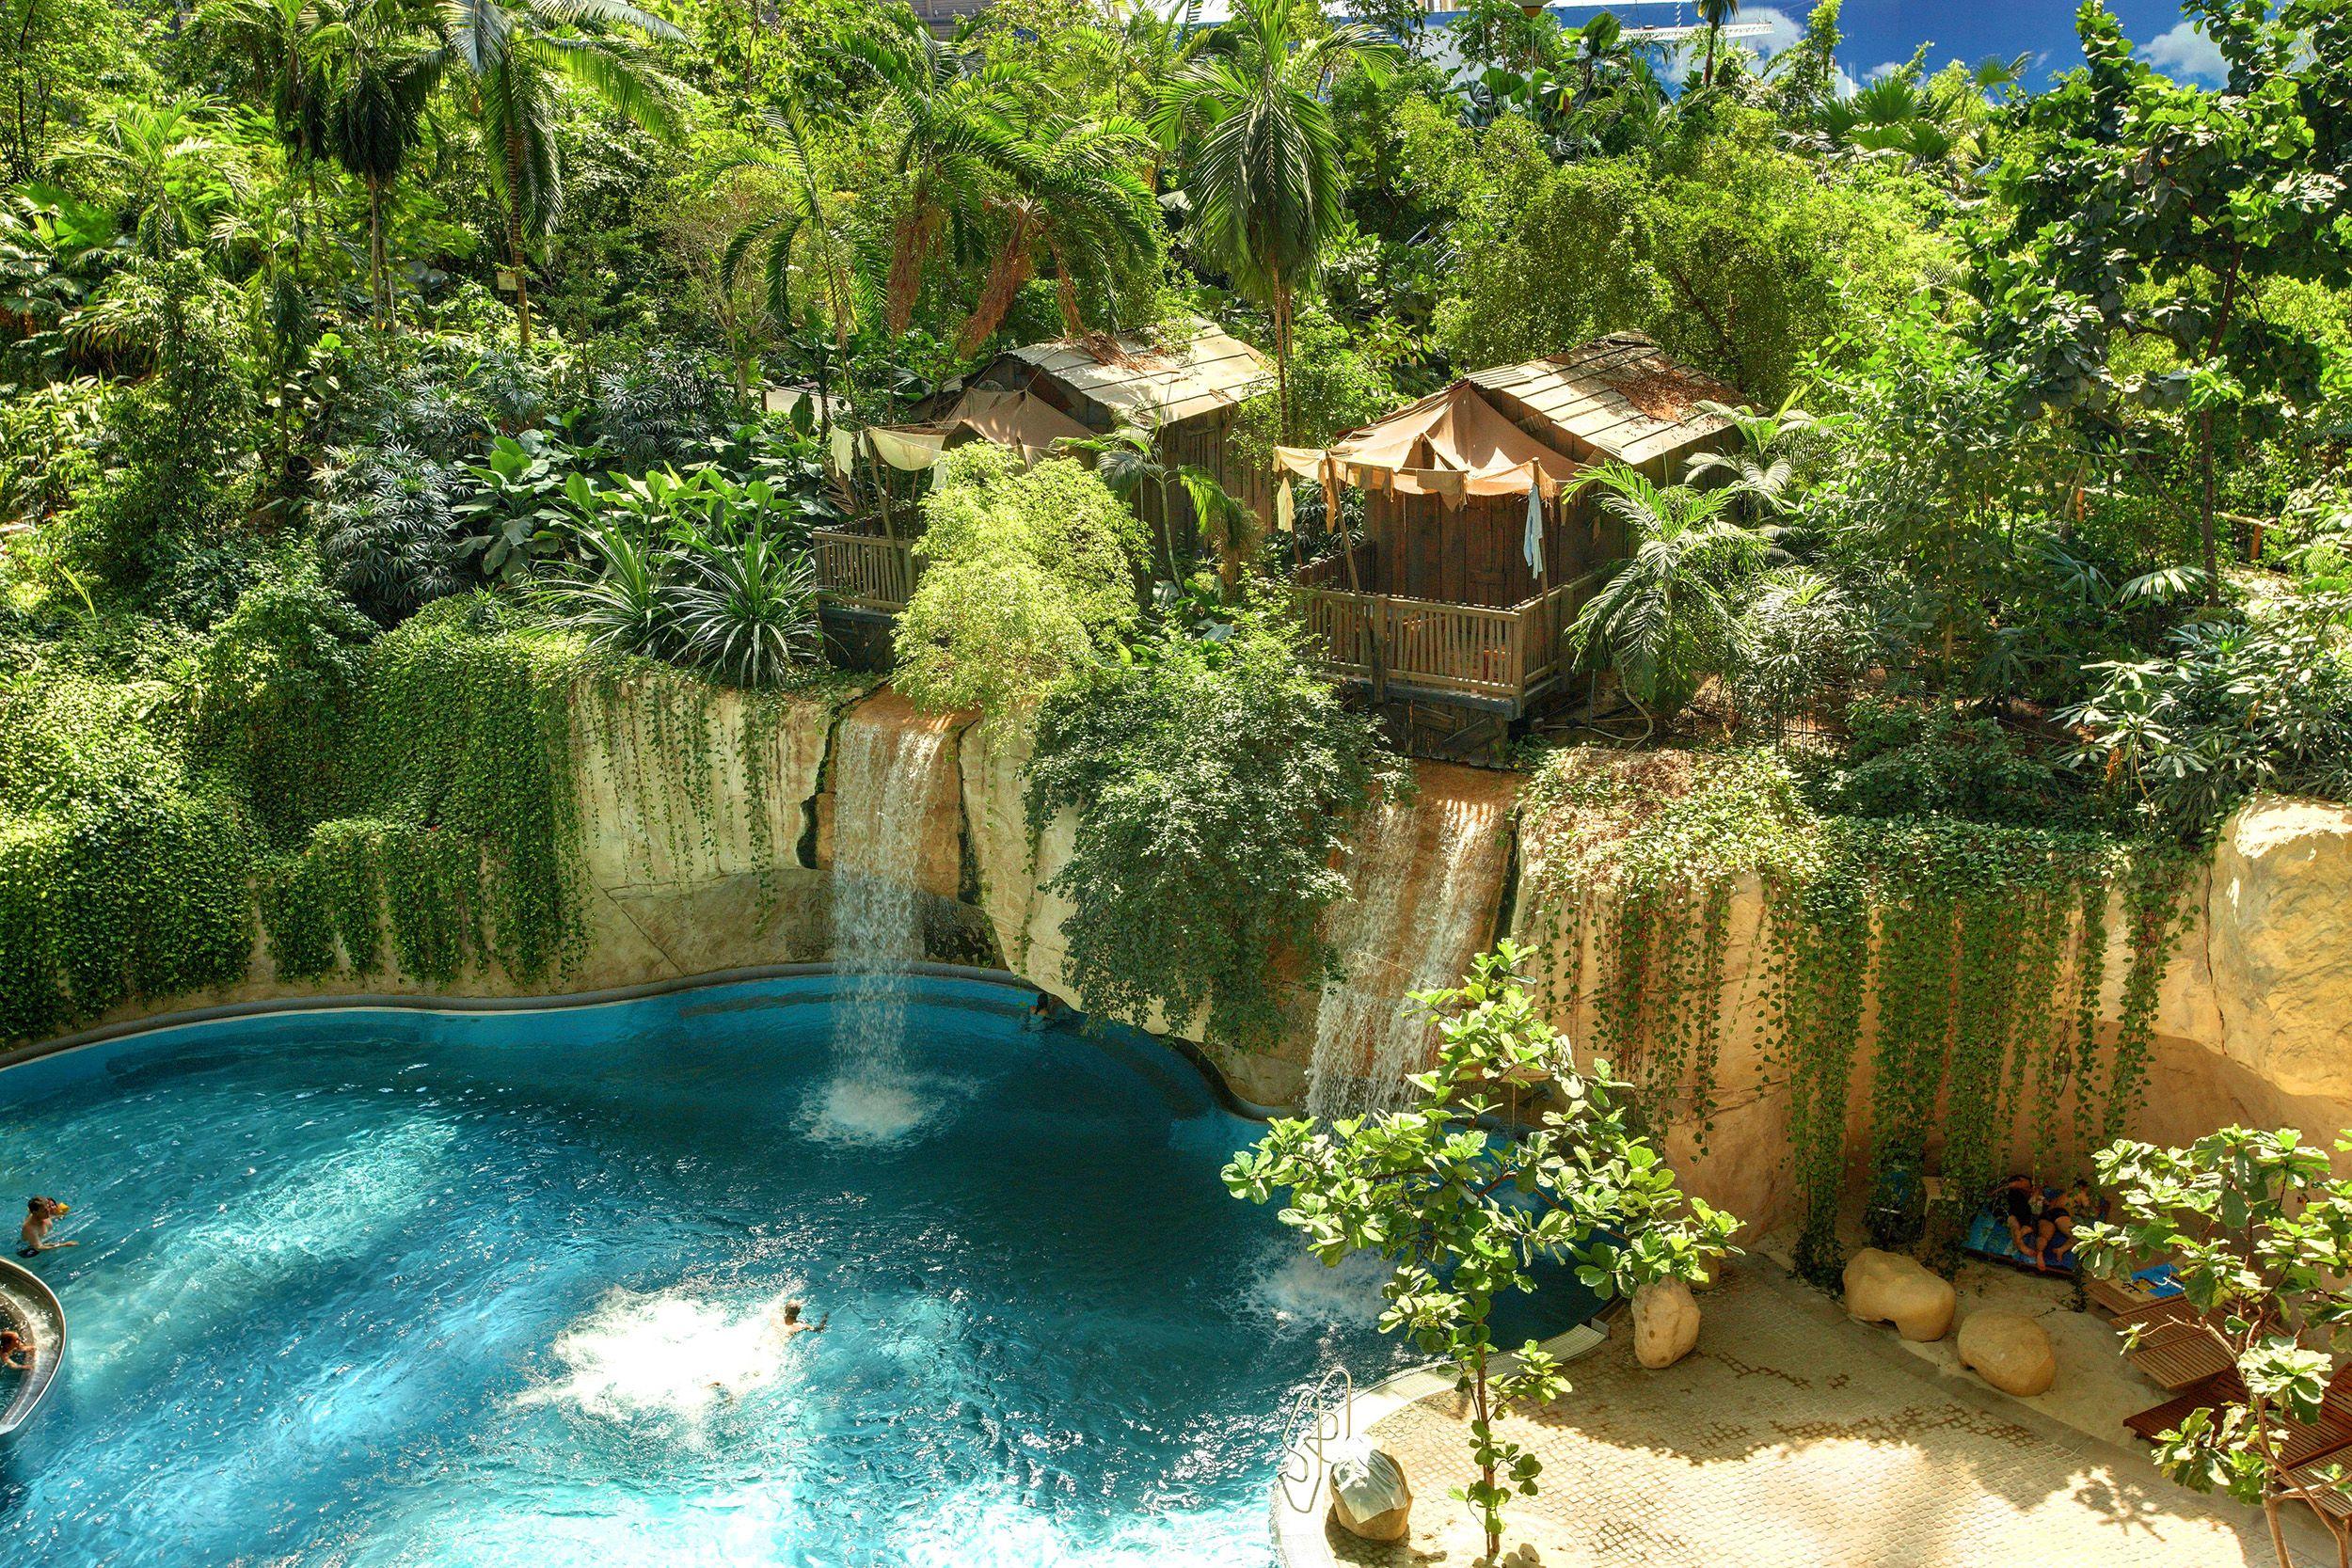 Tropical Waterfall Photos Tropical Rainforest Waterfall Tropical Islands Resort Indoor Beach Island Resort